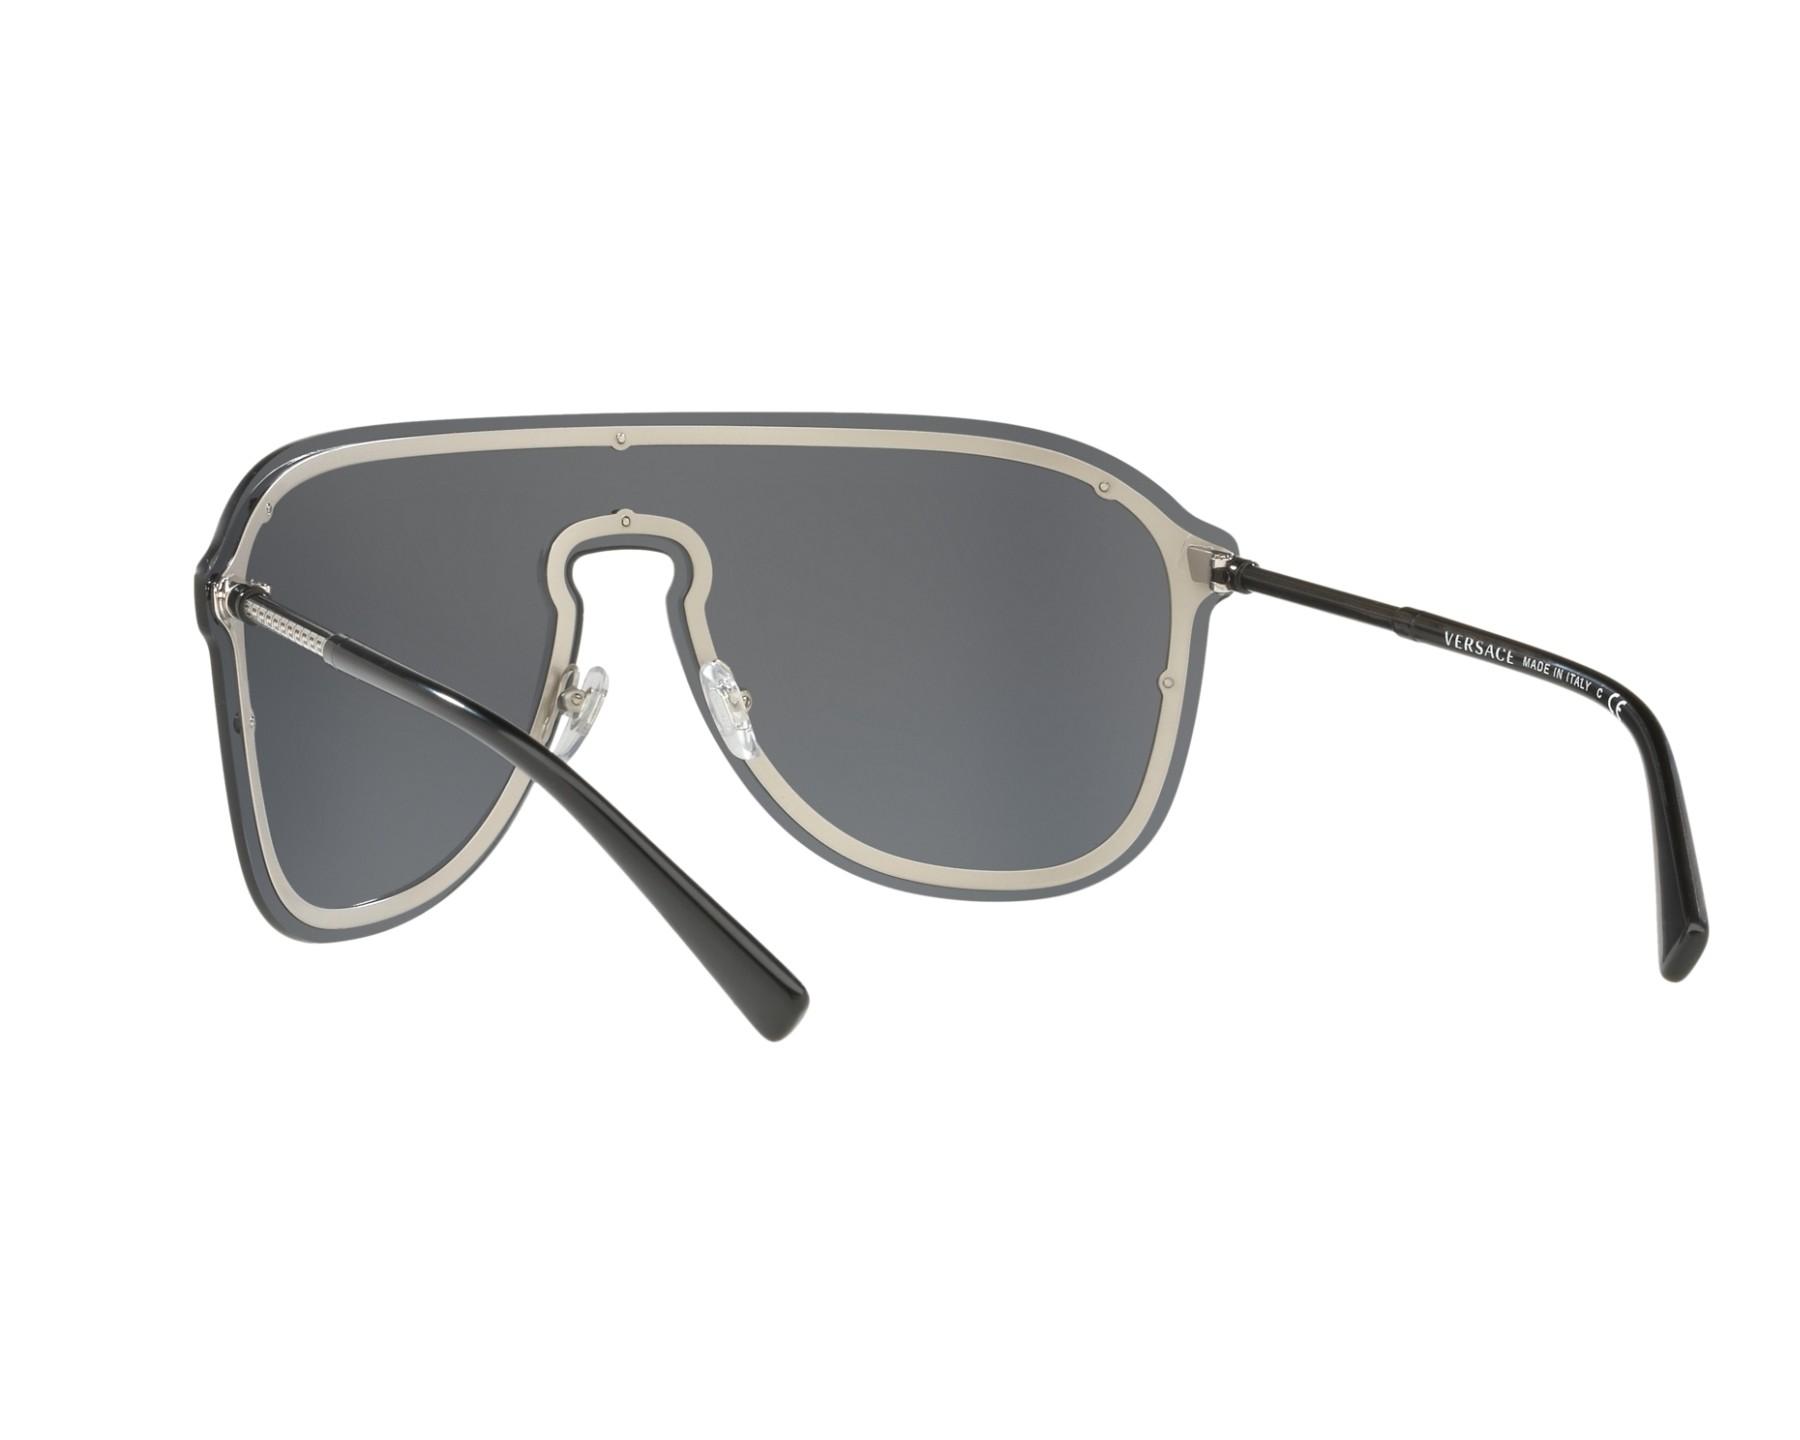 2616d2f655 Sunglasses Versace VE-2180 100087 44- Black 360 degree view 6